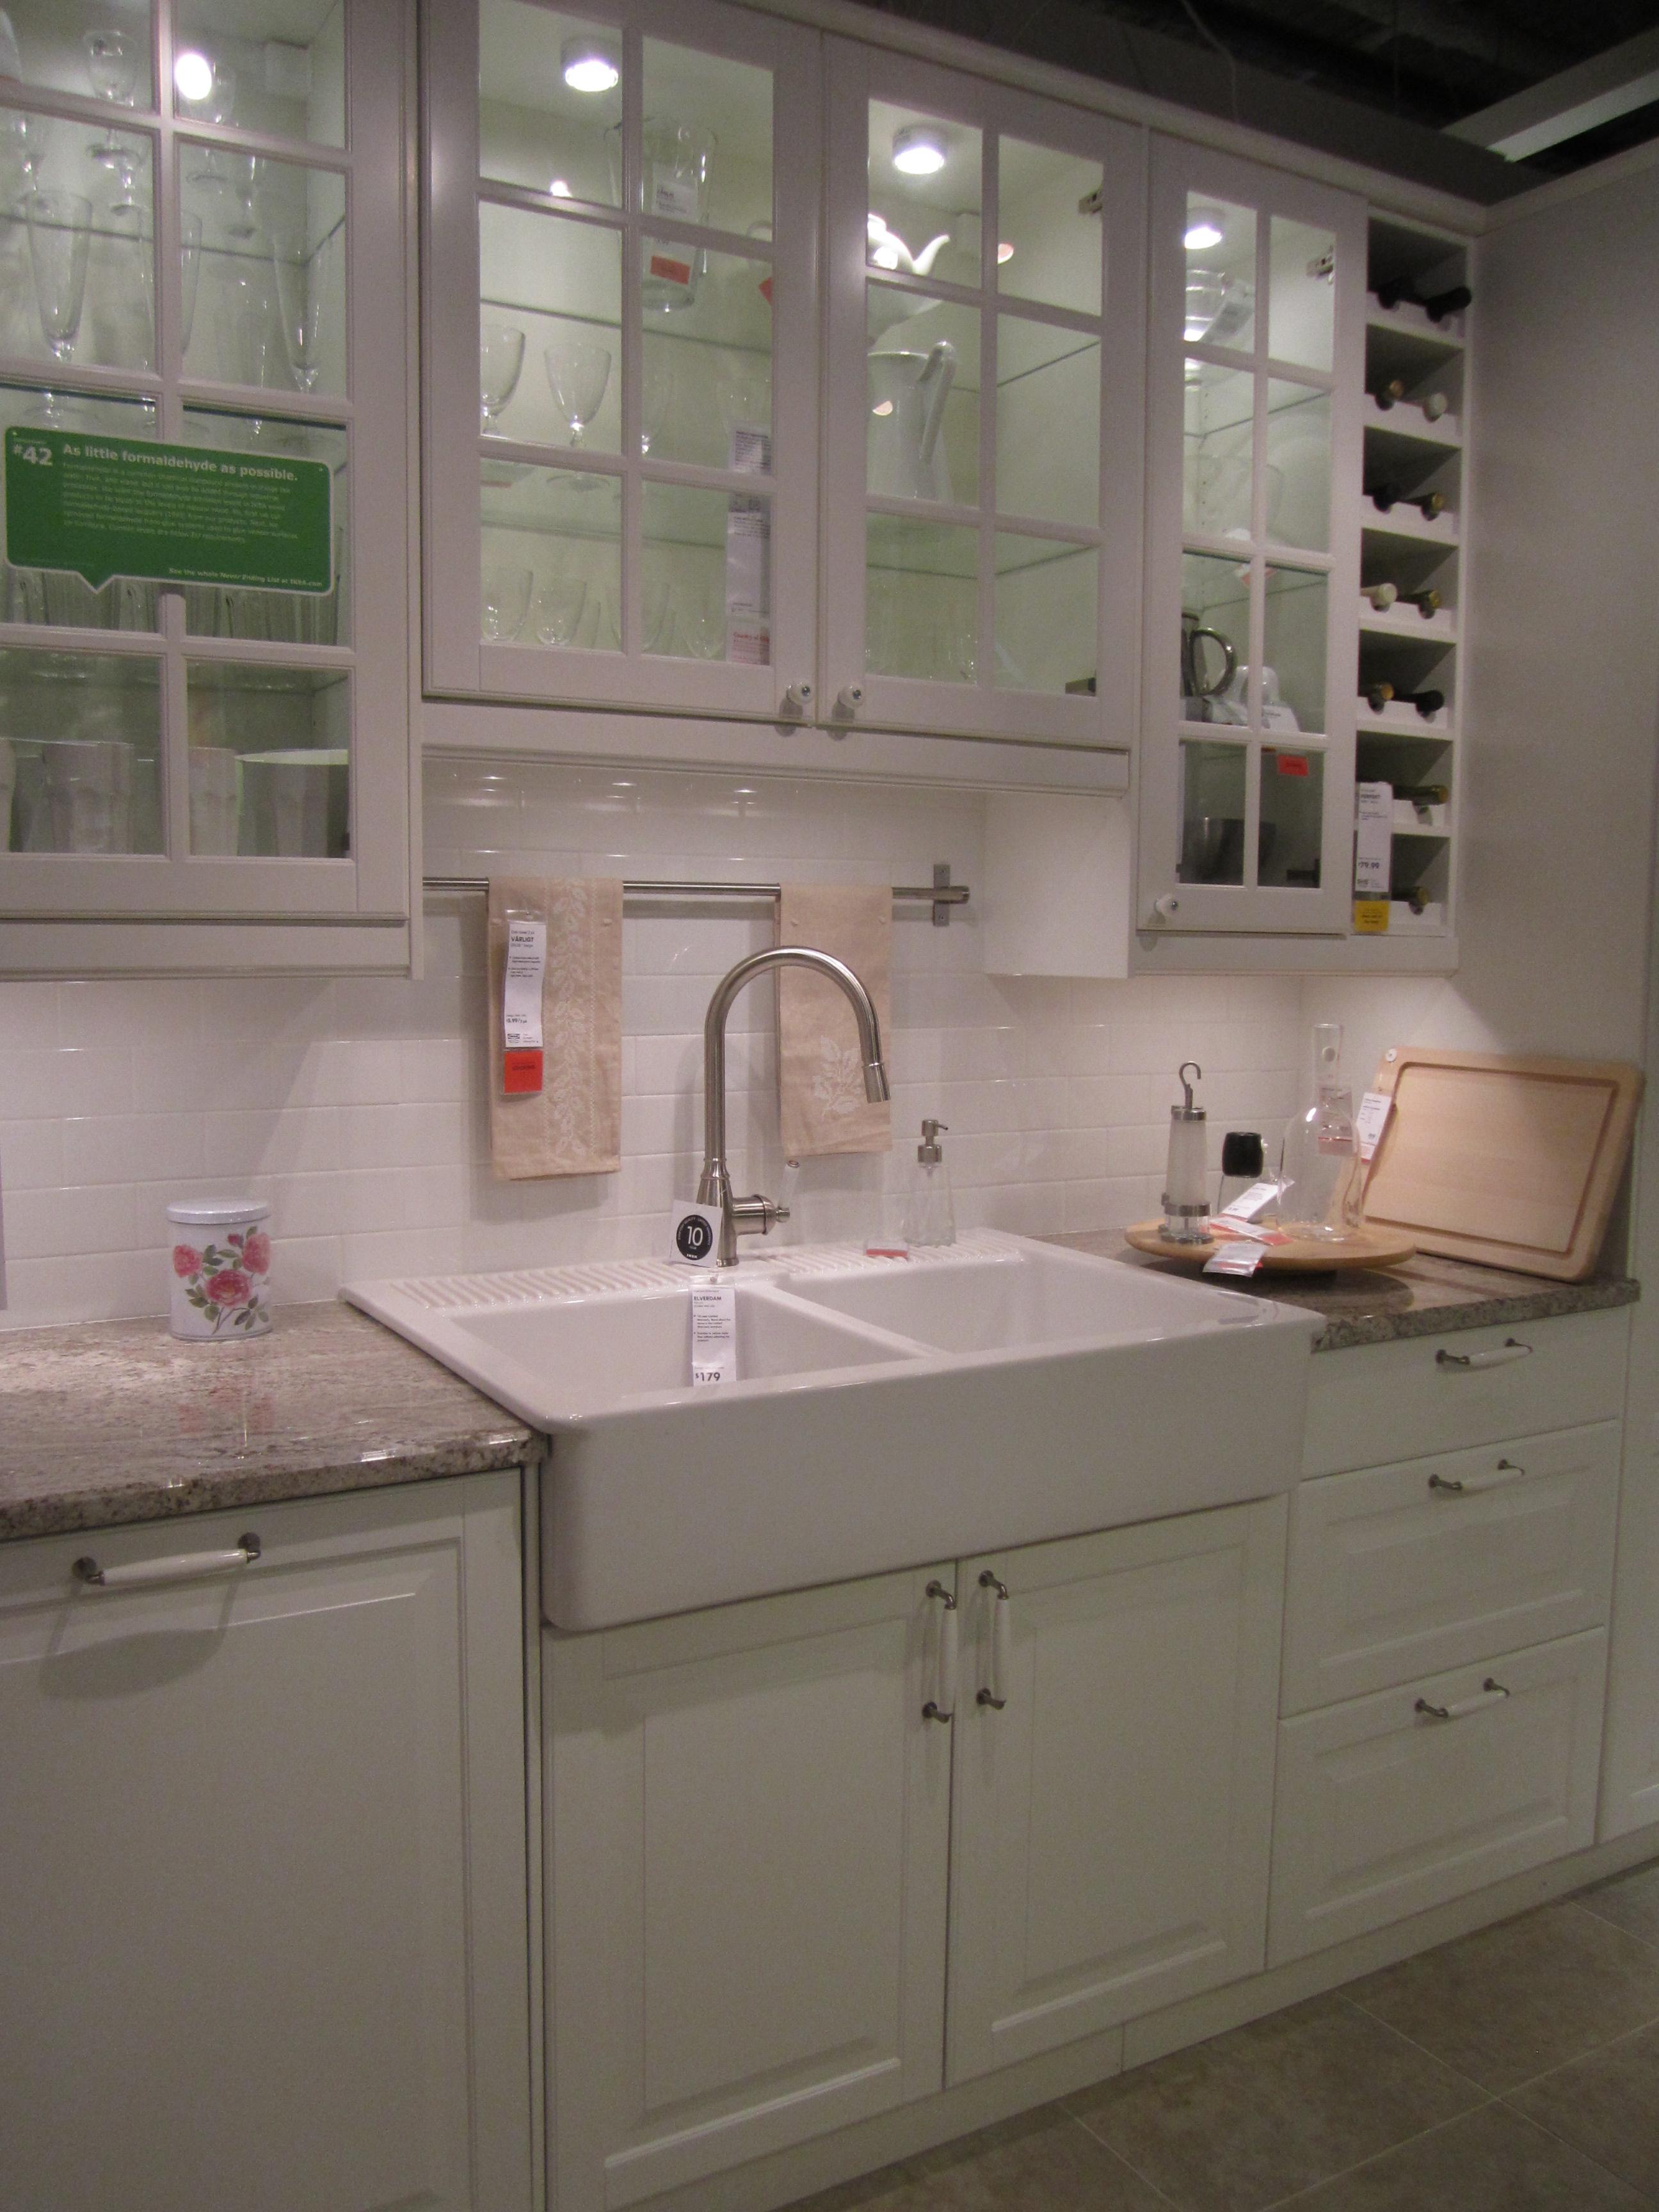 Ikea Kjokken Lidingo ~ Hjemme Design og M?bler Ideer